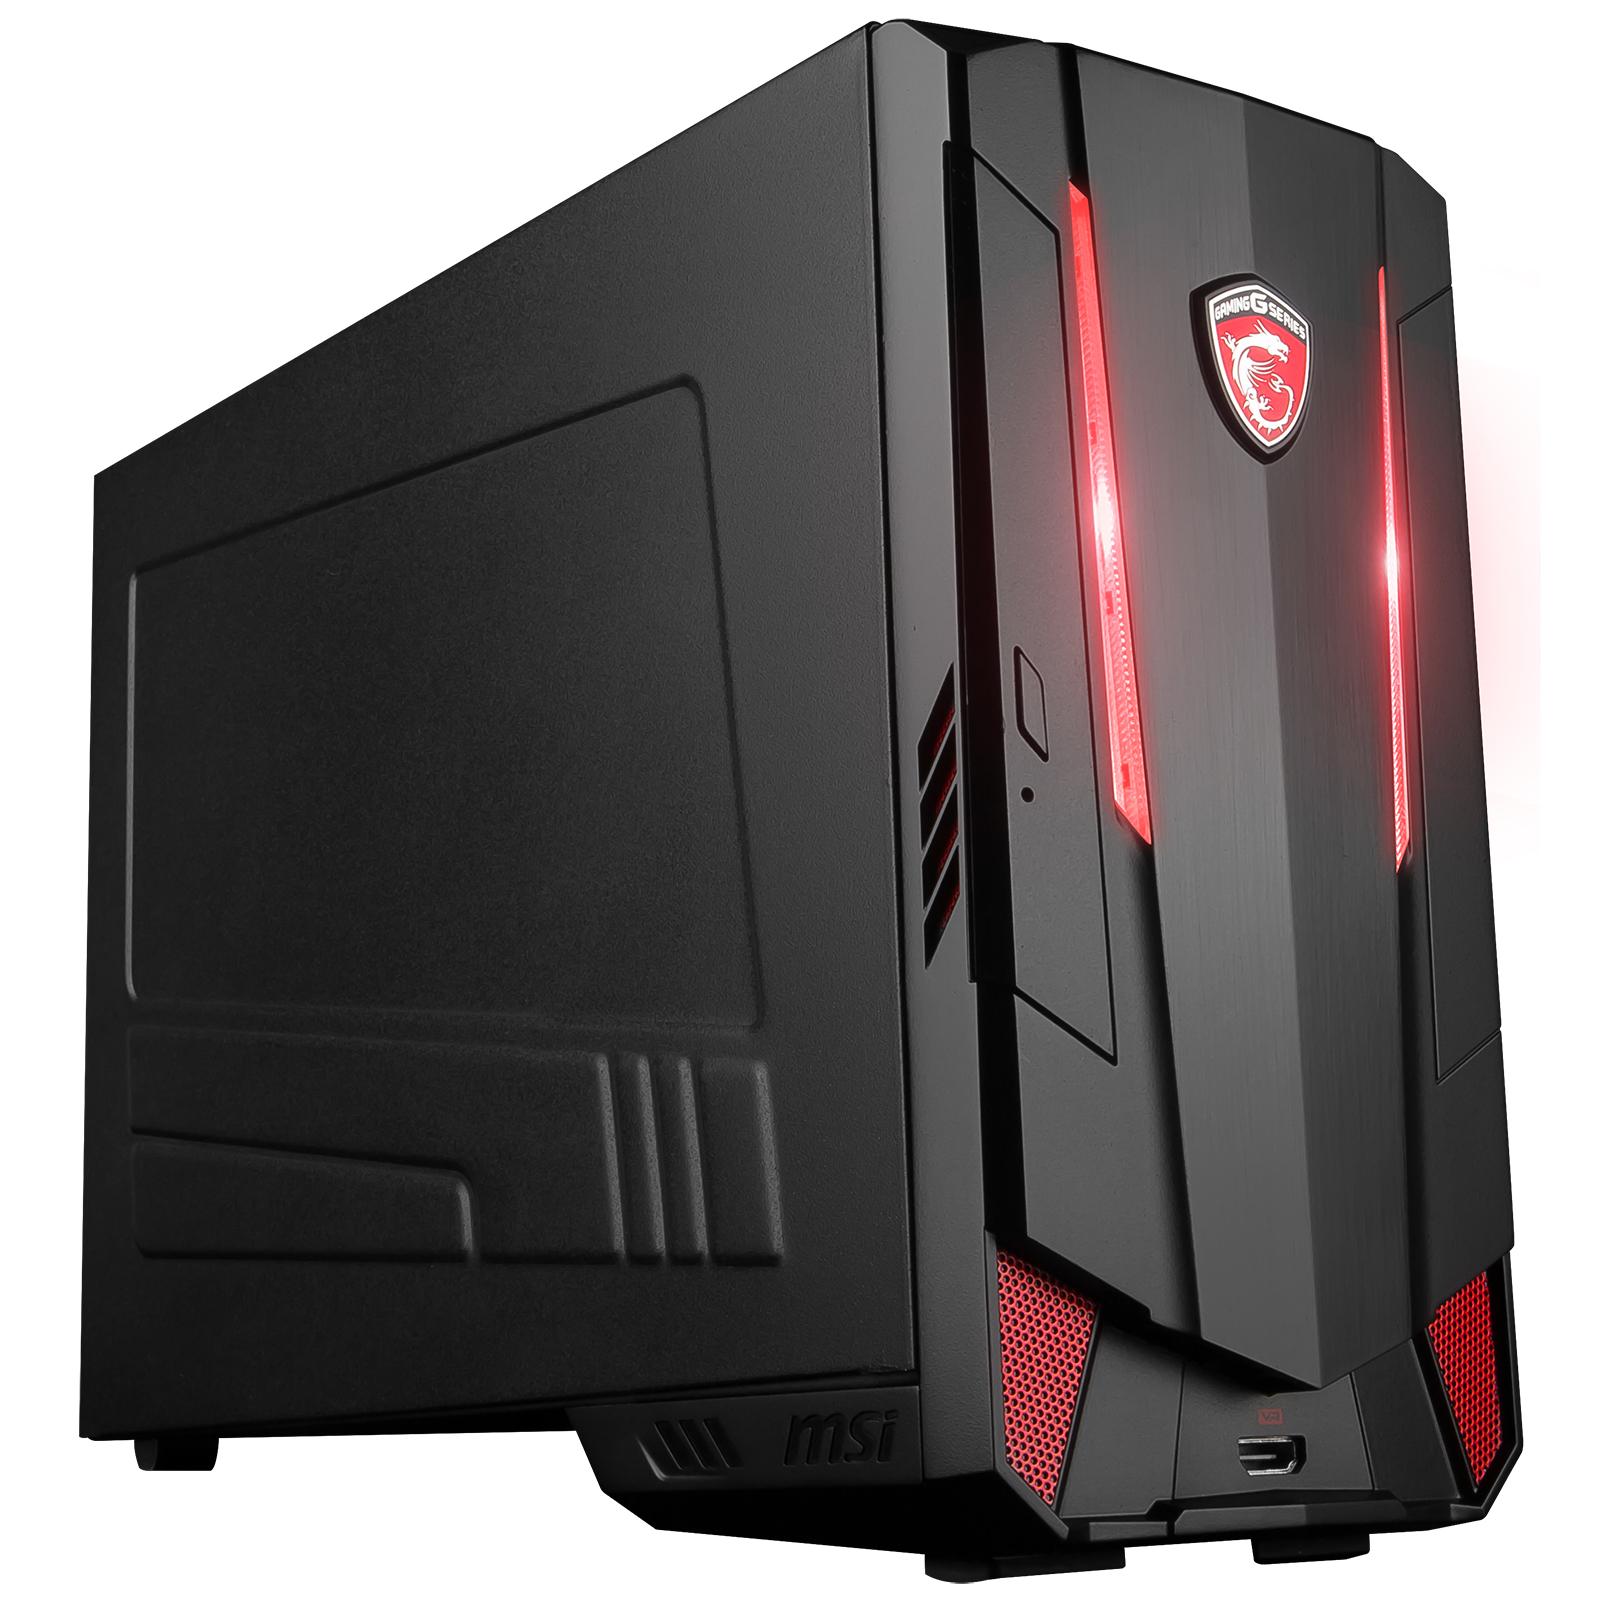 PC de bureau MSI Nightblade MI3-VR7RC-074EU Intel Core i5-7400 8 Go SSD 128 Go + HDD 1 To NVIDIA GeForce GTX 1060 6 Go Wi-Fi AC/Bluetooth Windows 10 Famille 64 bits